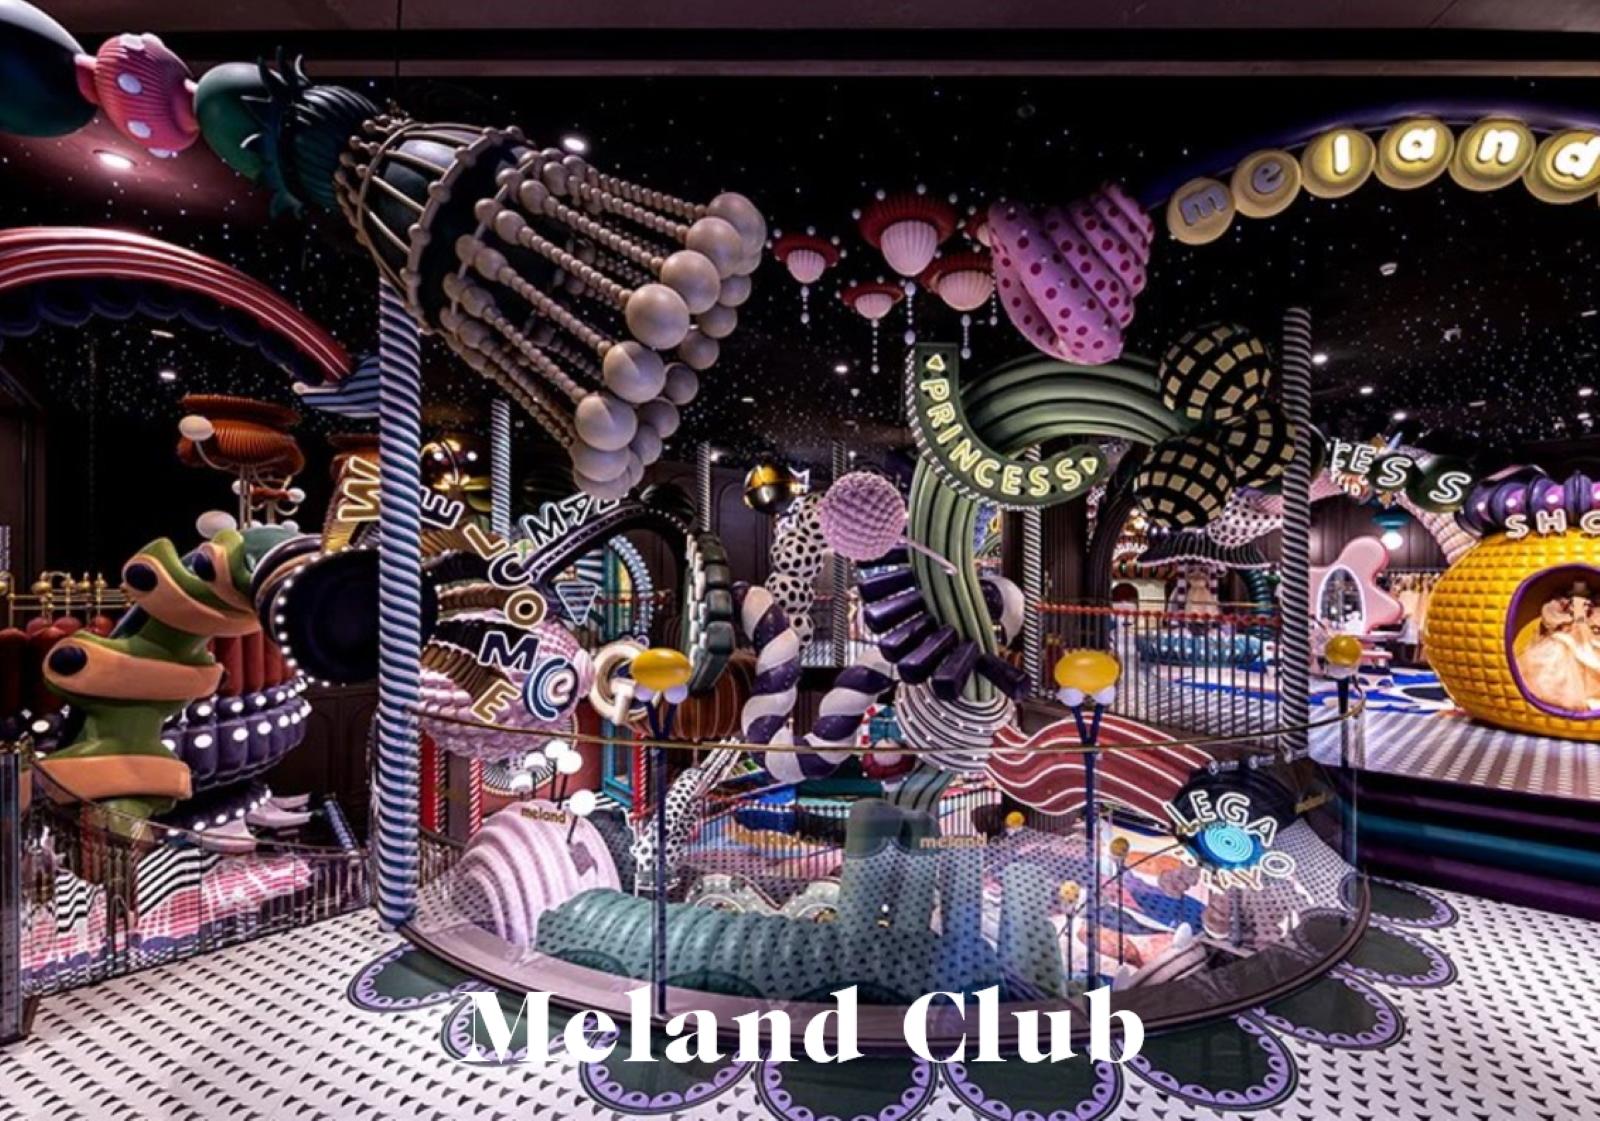 Meland club innovation tour missions mmm 0